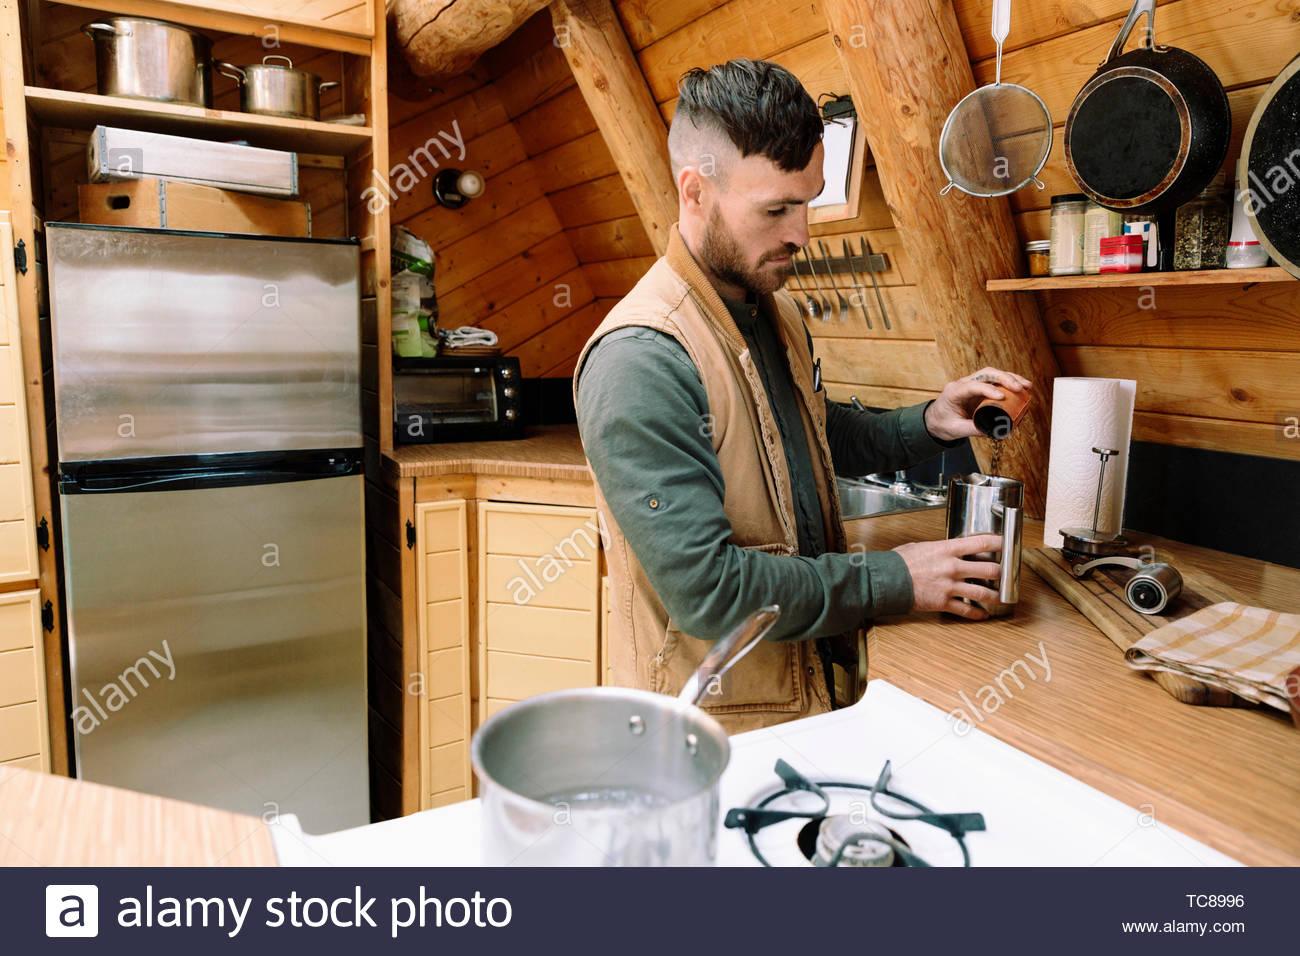 Man preparing coffee in cabin kitchen - Stock Image